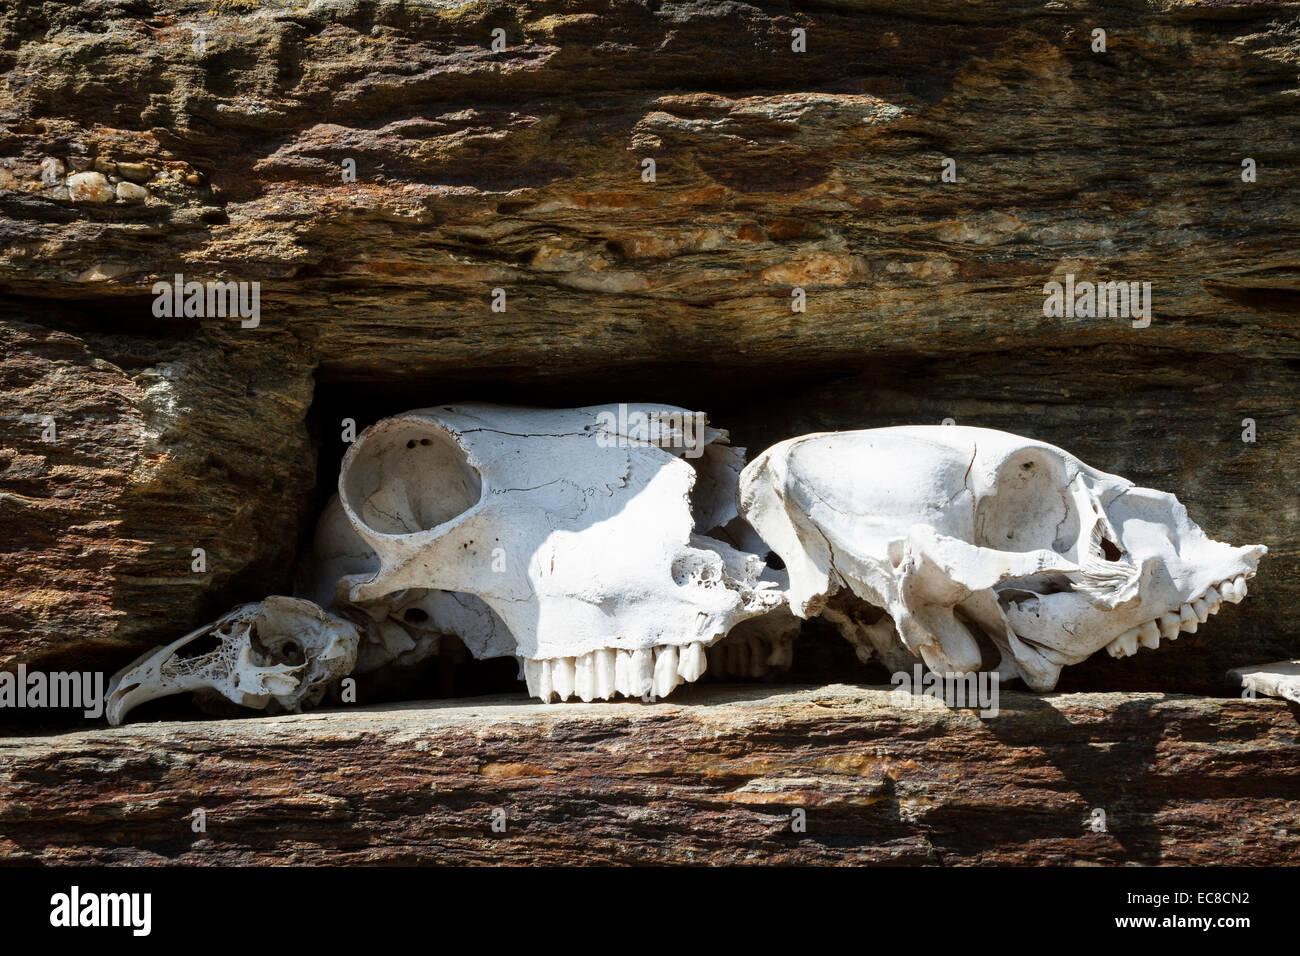 animals skull bones on schist wall - Stock Image